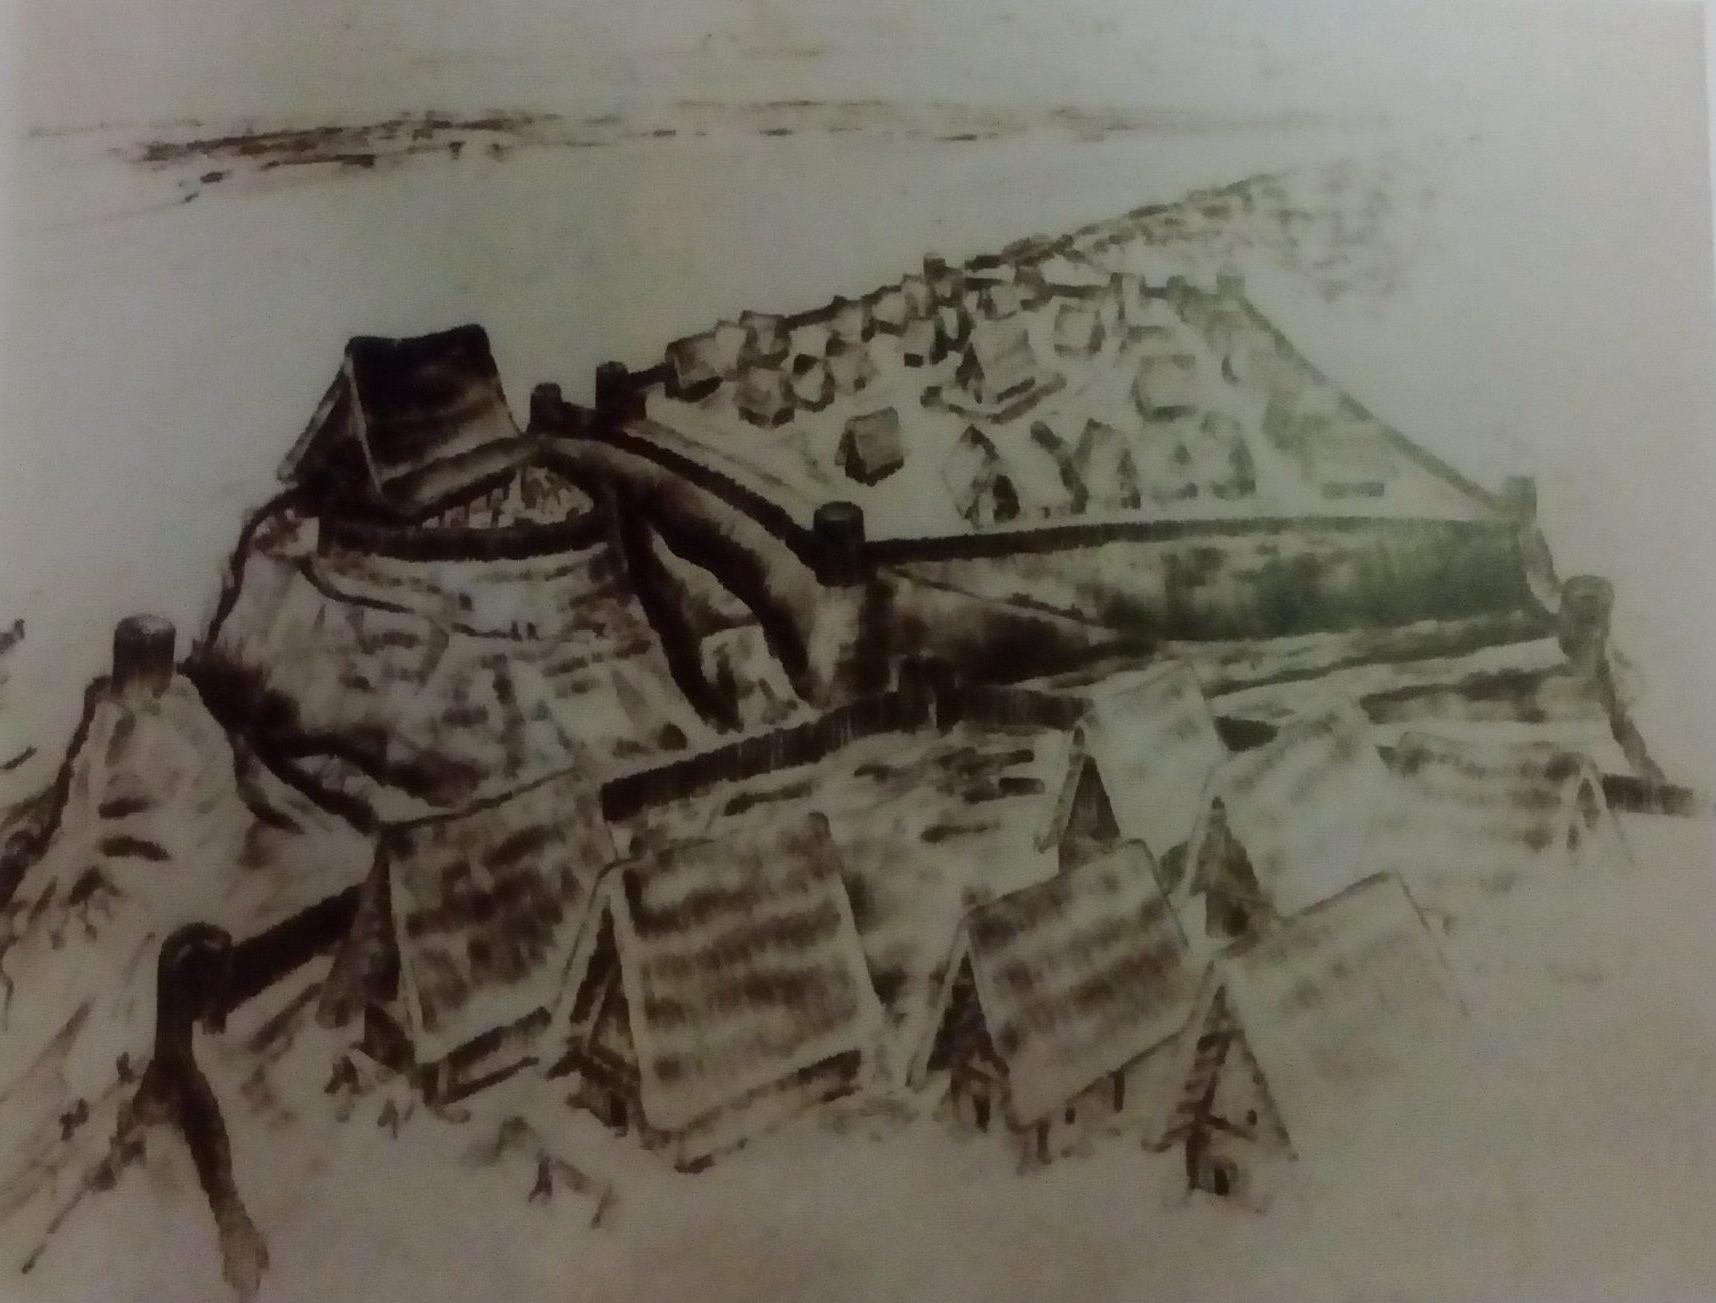 Mogući izgled vučedolskog naselja (J. Brunschmid)